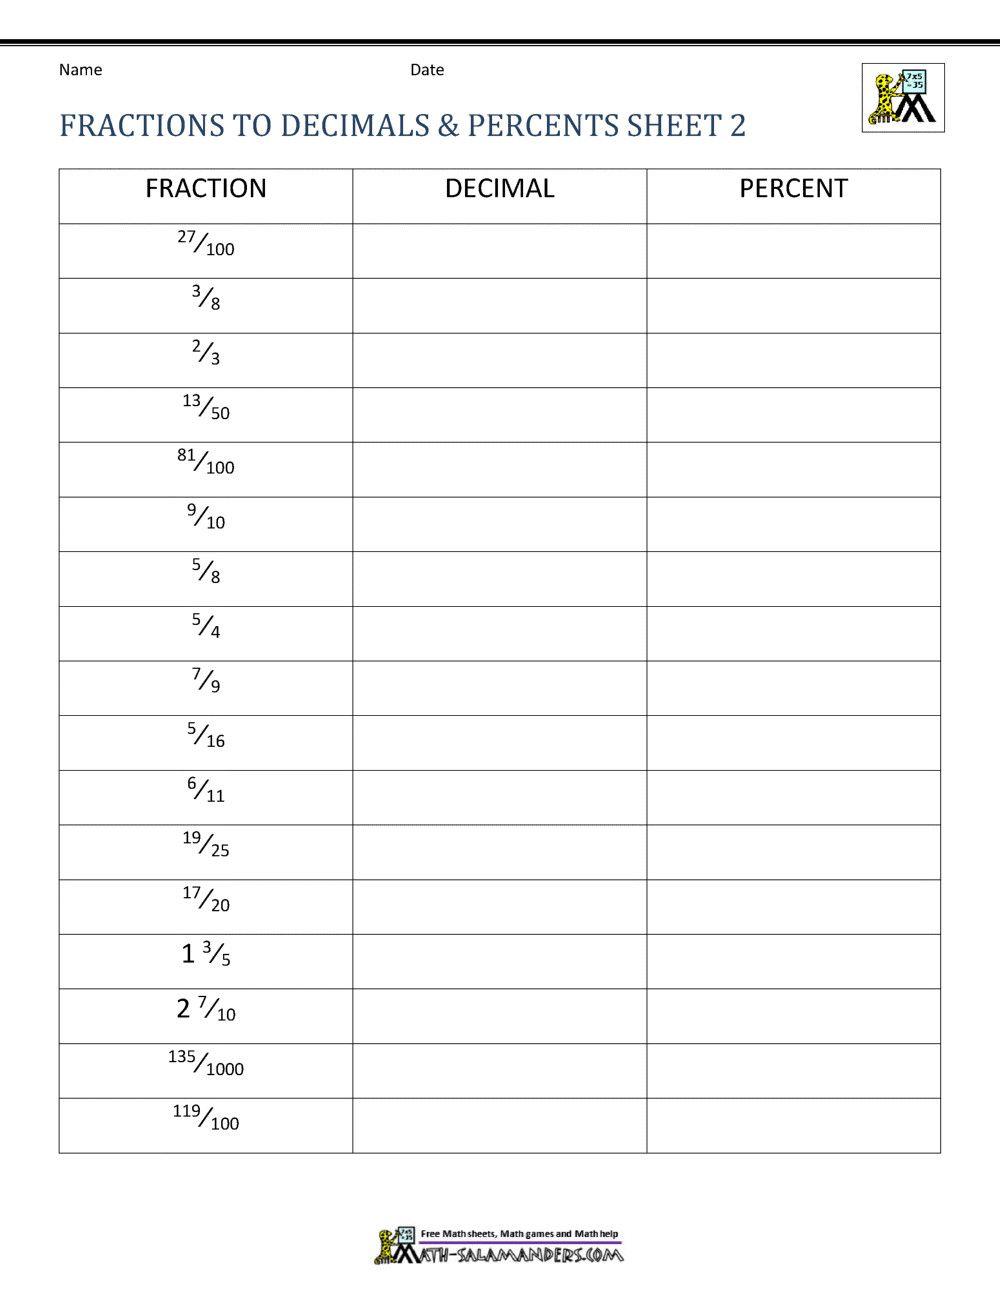 Wonderful Fraction Decimal Percent Chart in 2020 Math